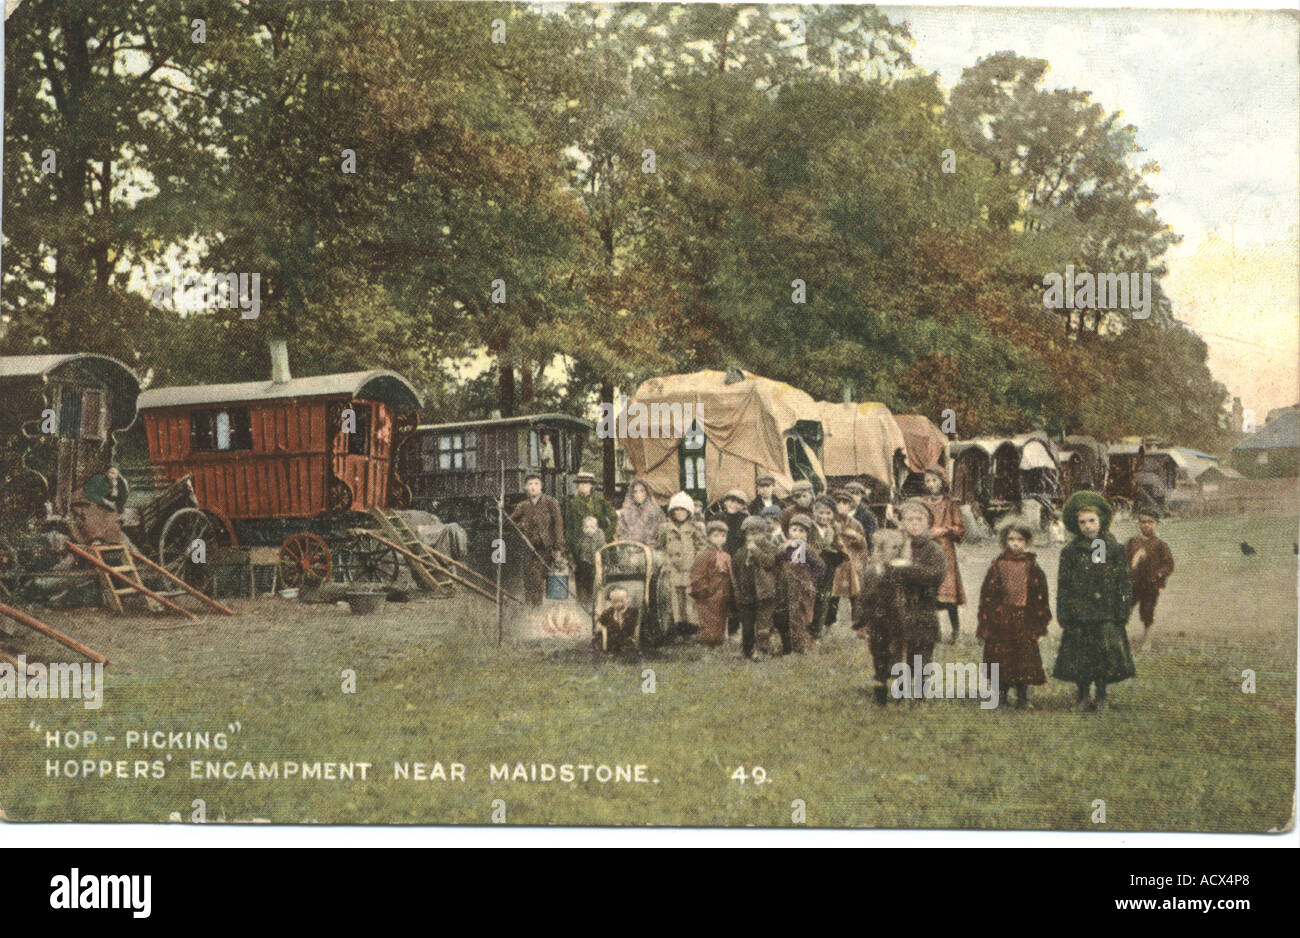 Postcard of 'Hoppers encampment near Maidstone' Kent circa 1910 - Stock Image